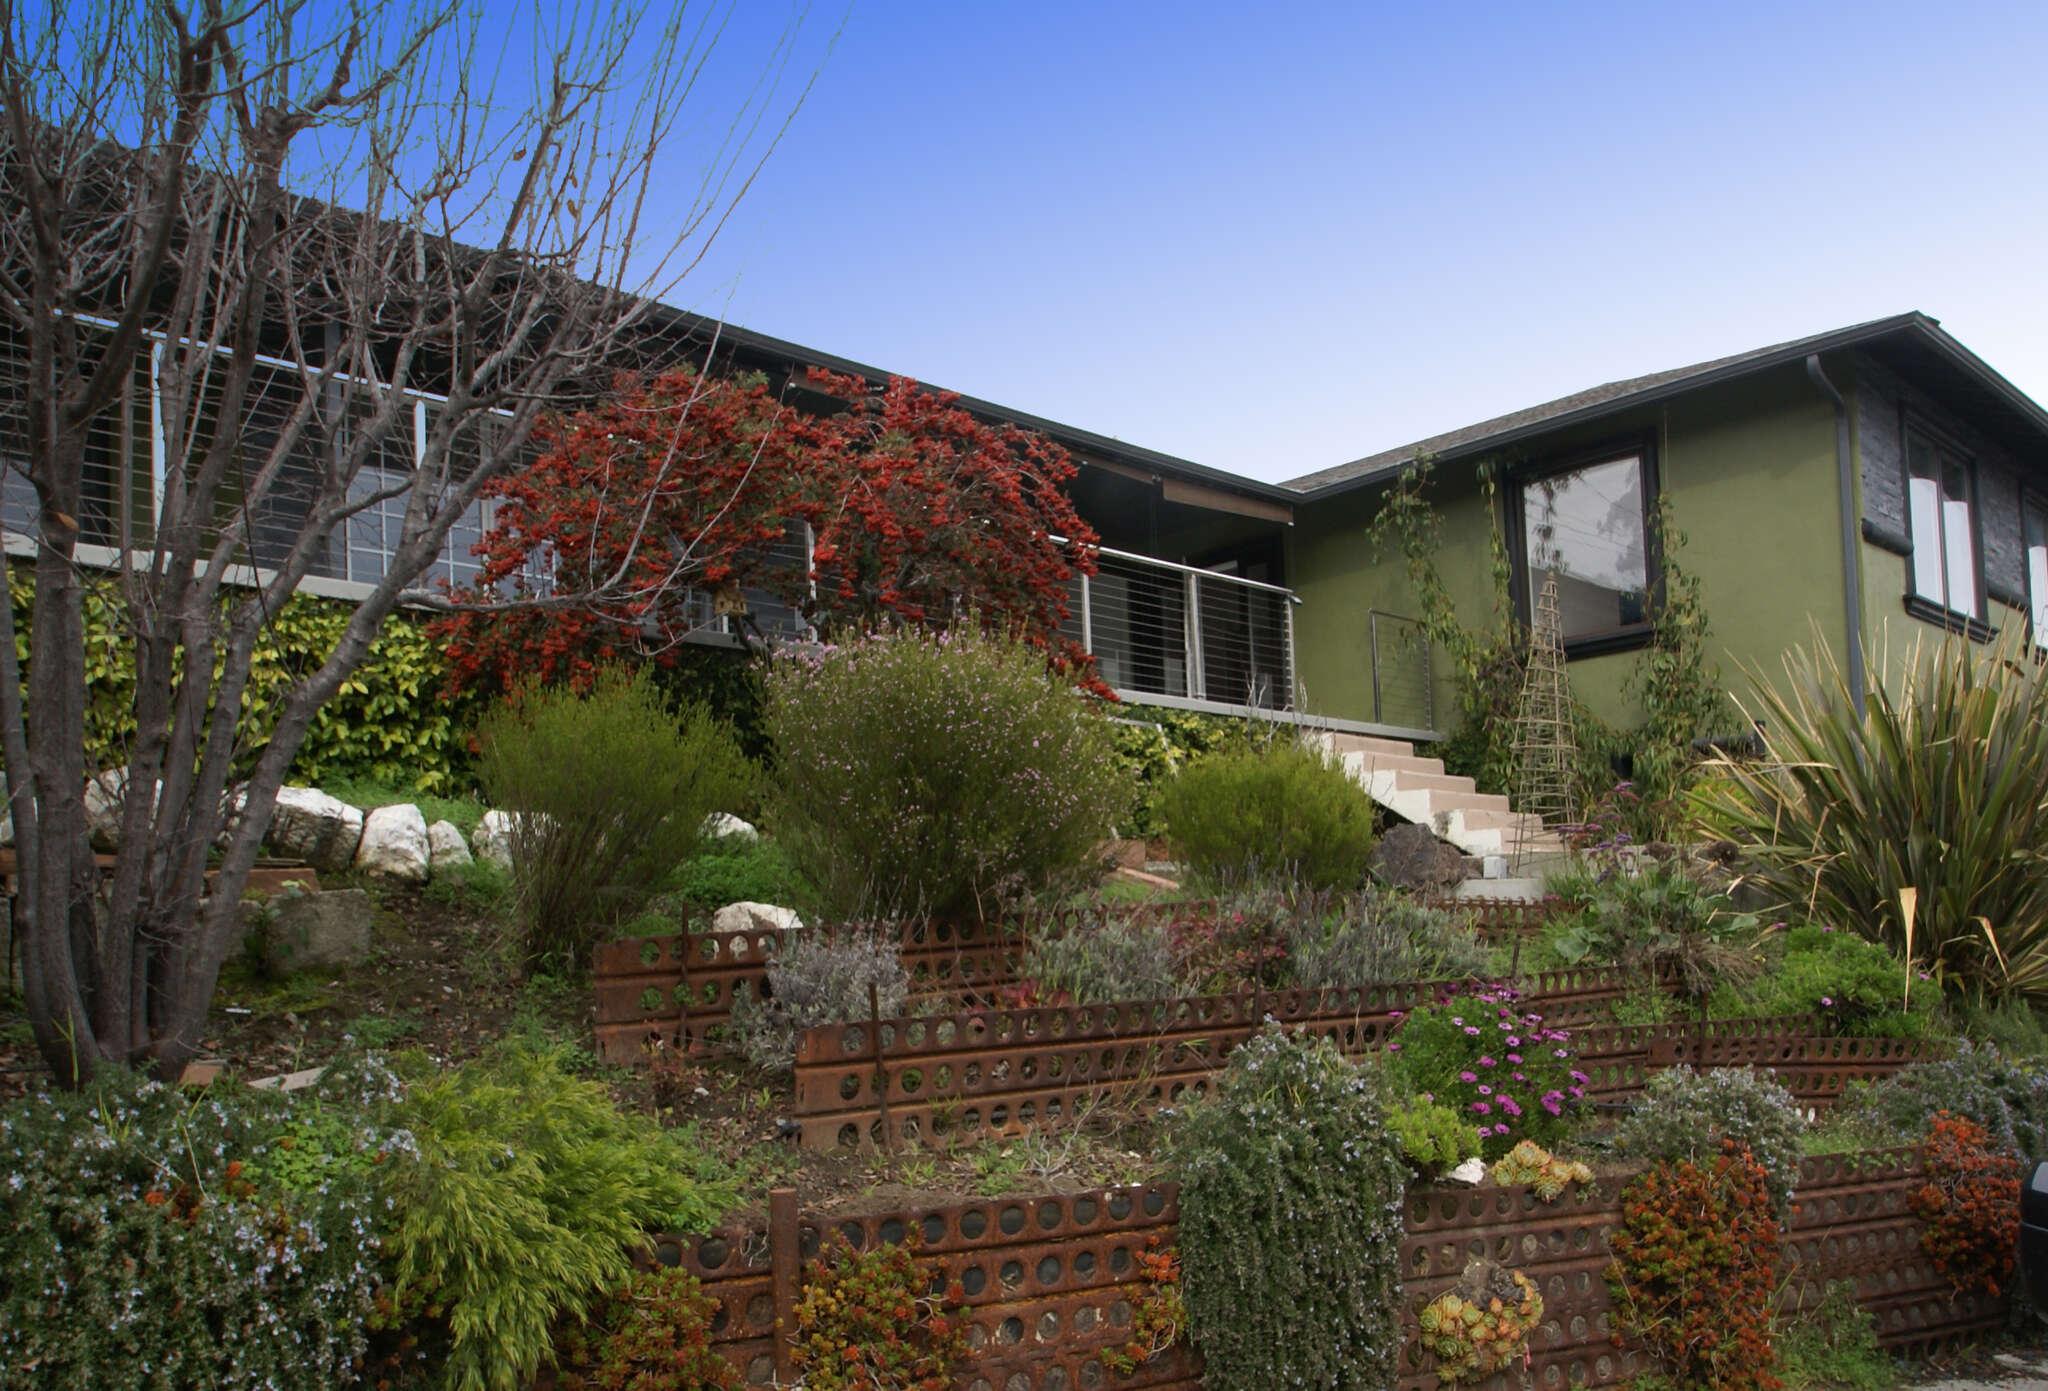 Single Family for Sale at 8 La Mancha Pl Millbrae, California 94030 United States